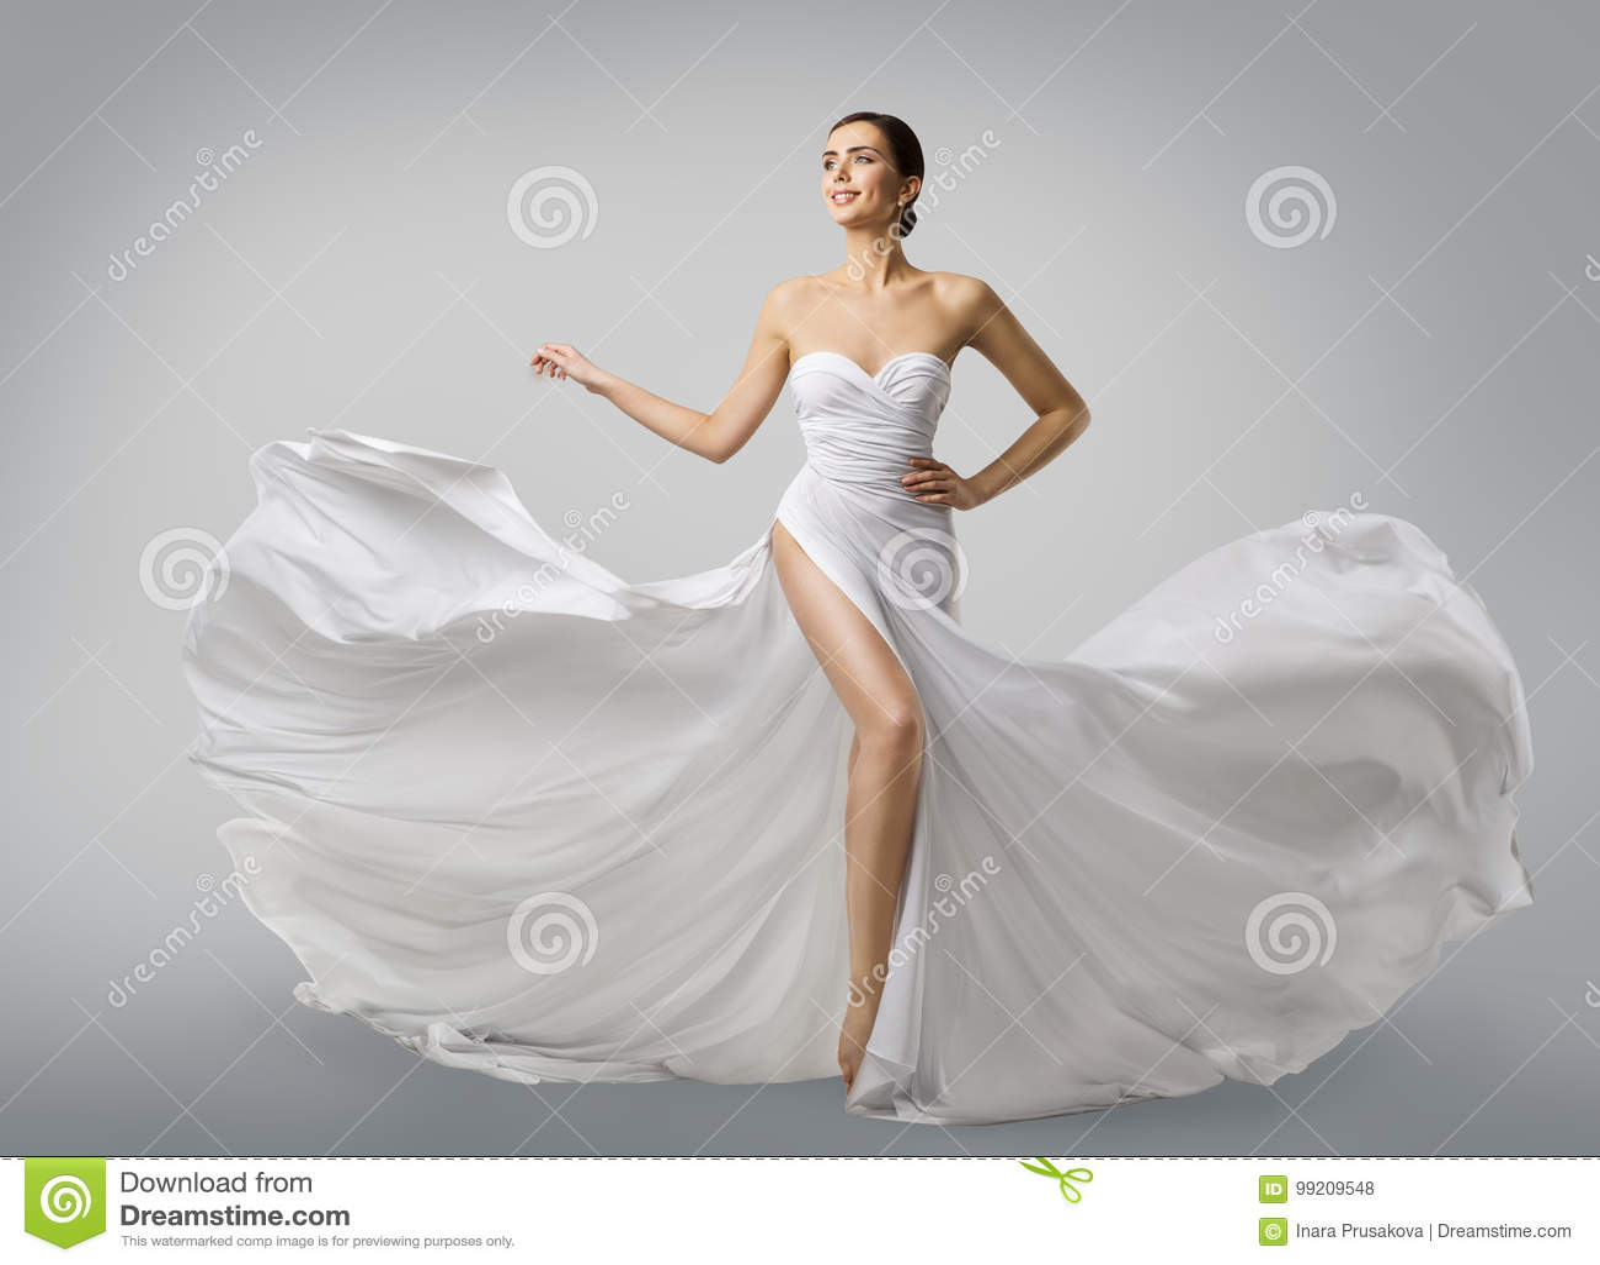 Woman White Dress, Fashion Model Bride In Long Silk Wedding Gown ...